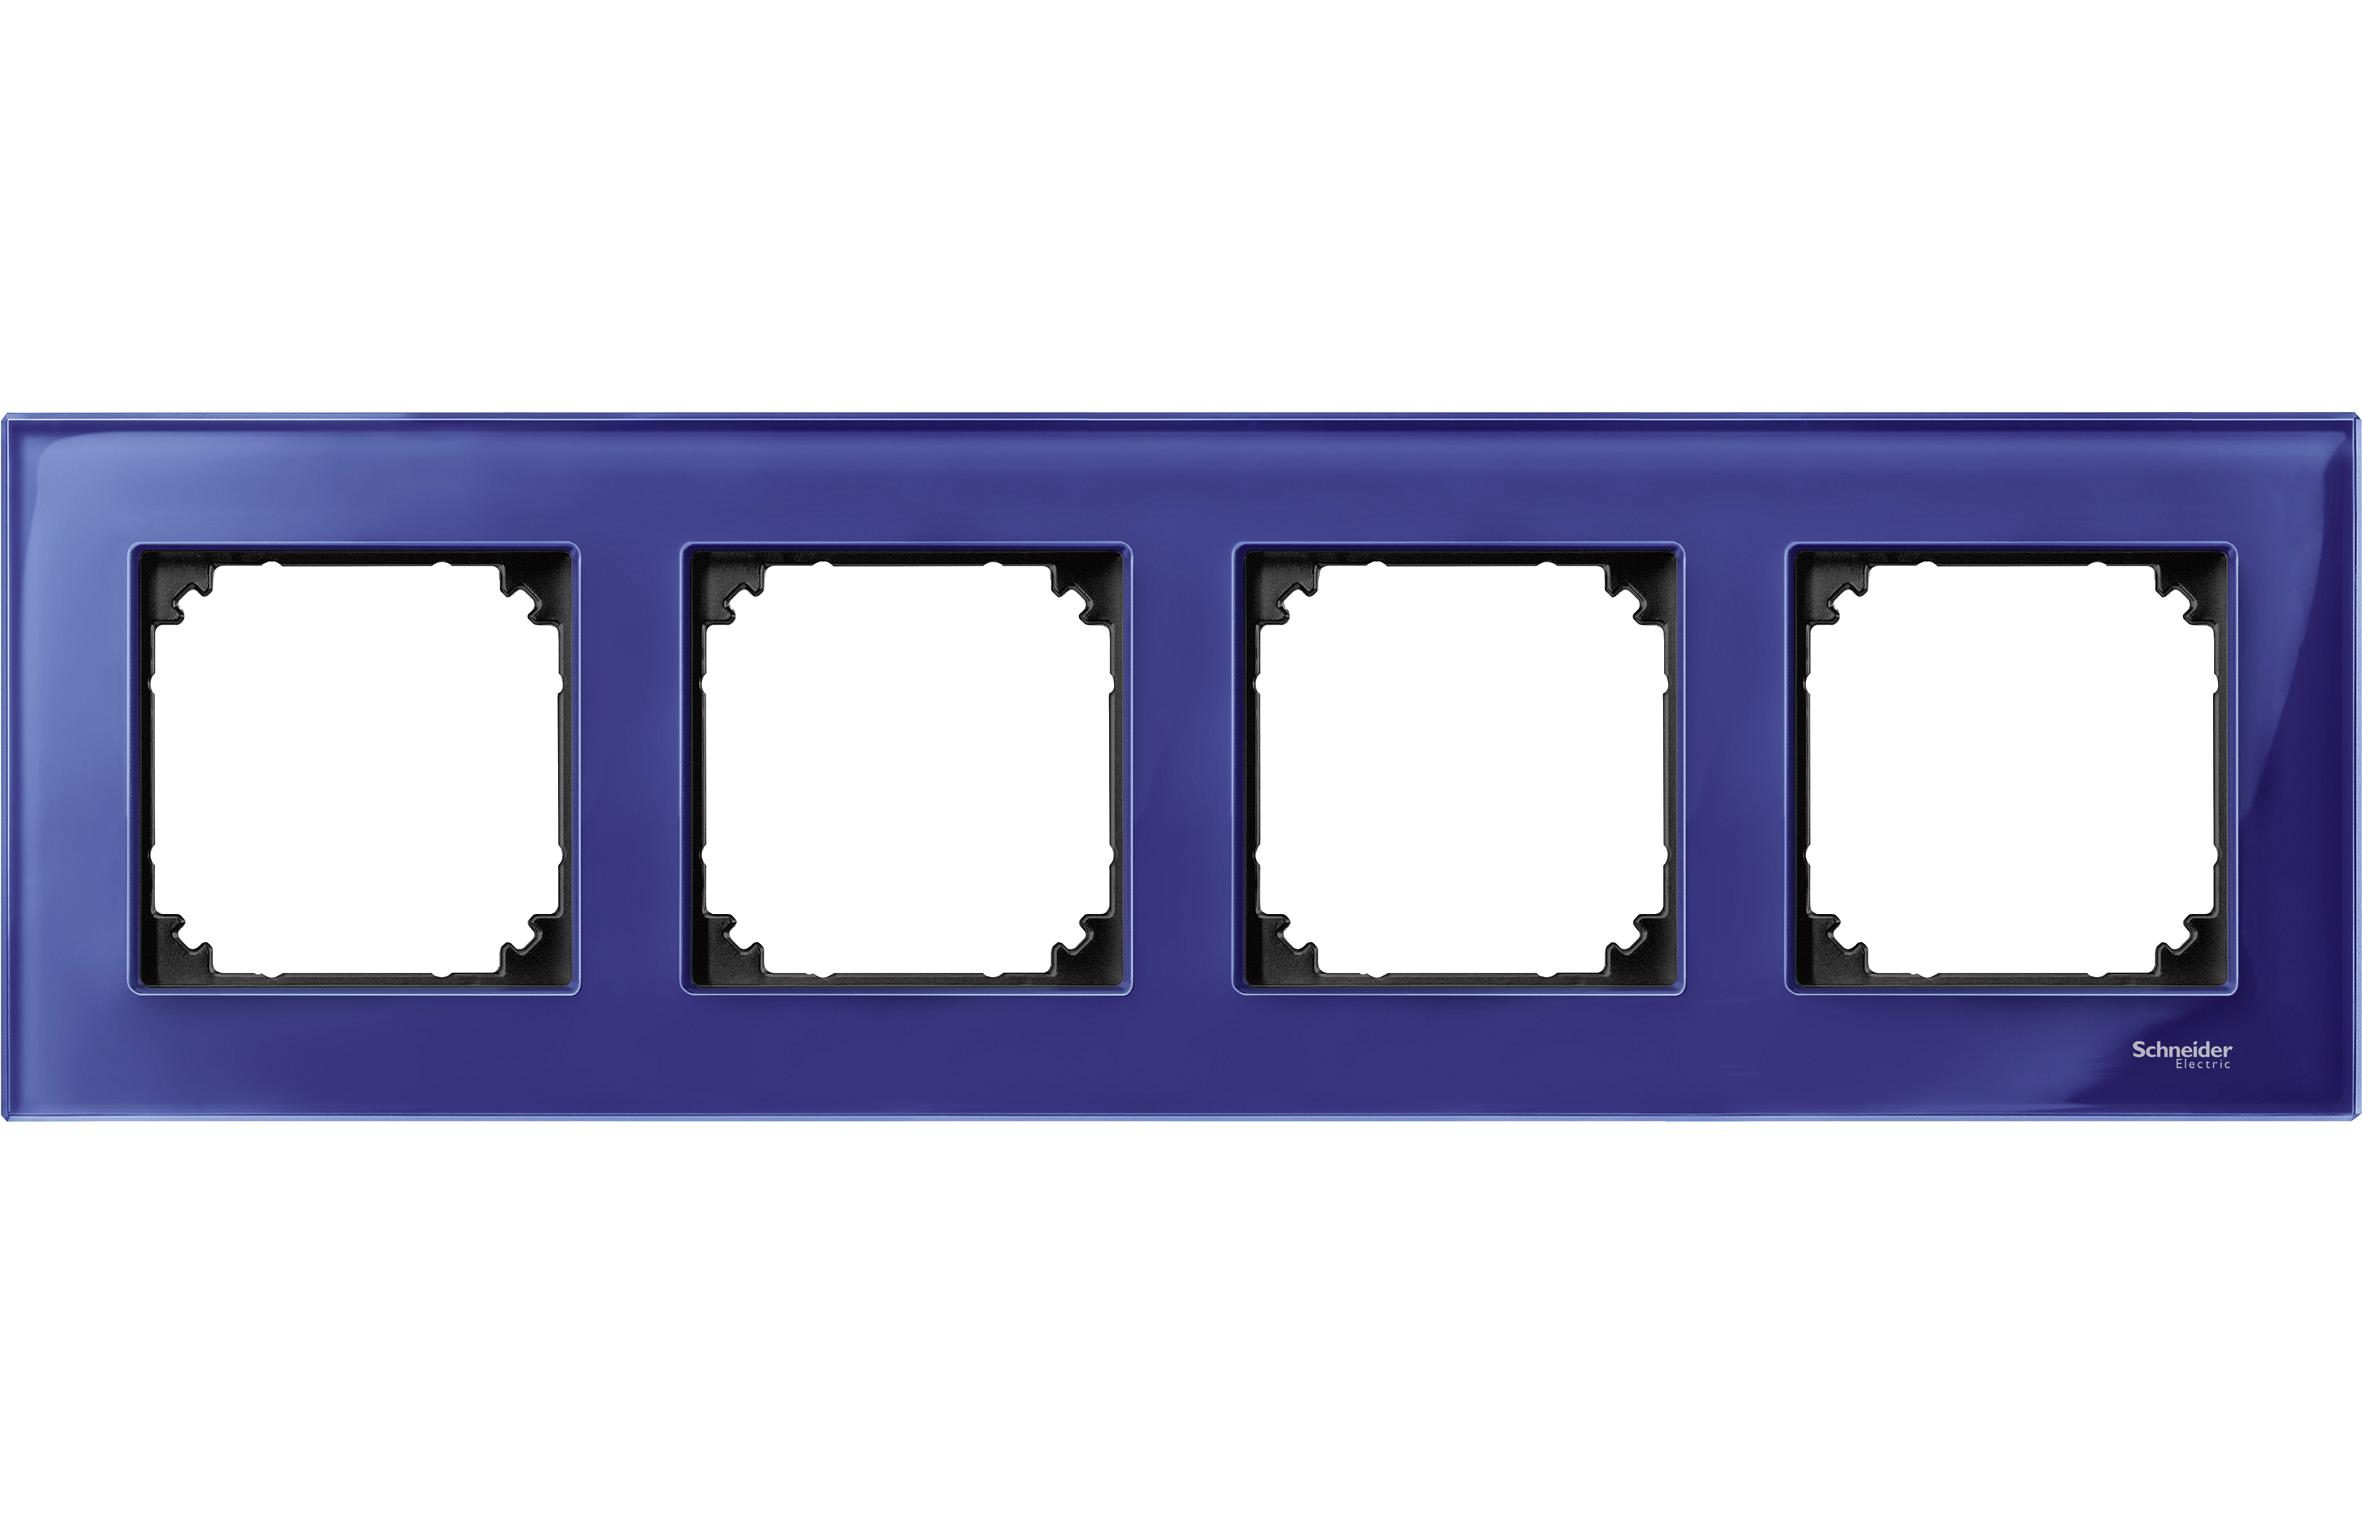 Image Description for https://tedi.itc-electronics.com/itcmedia/images/20190426/MTN40403278_SCHNEIDERELECTRIC_2.jpg